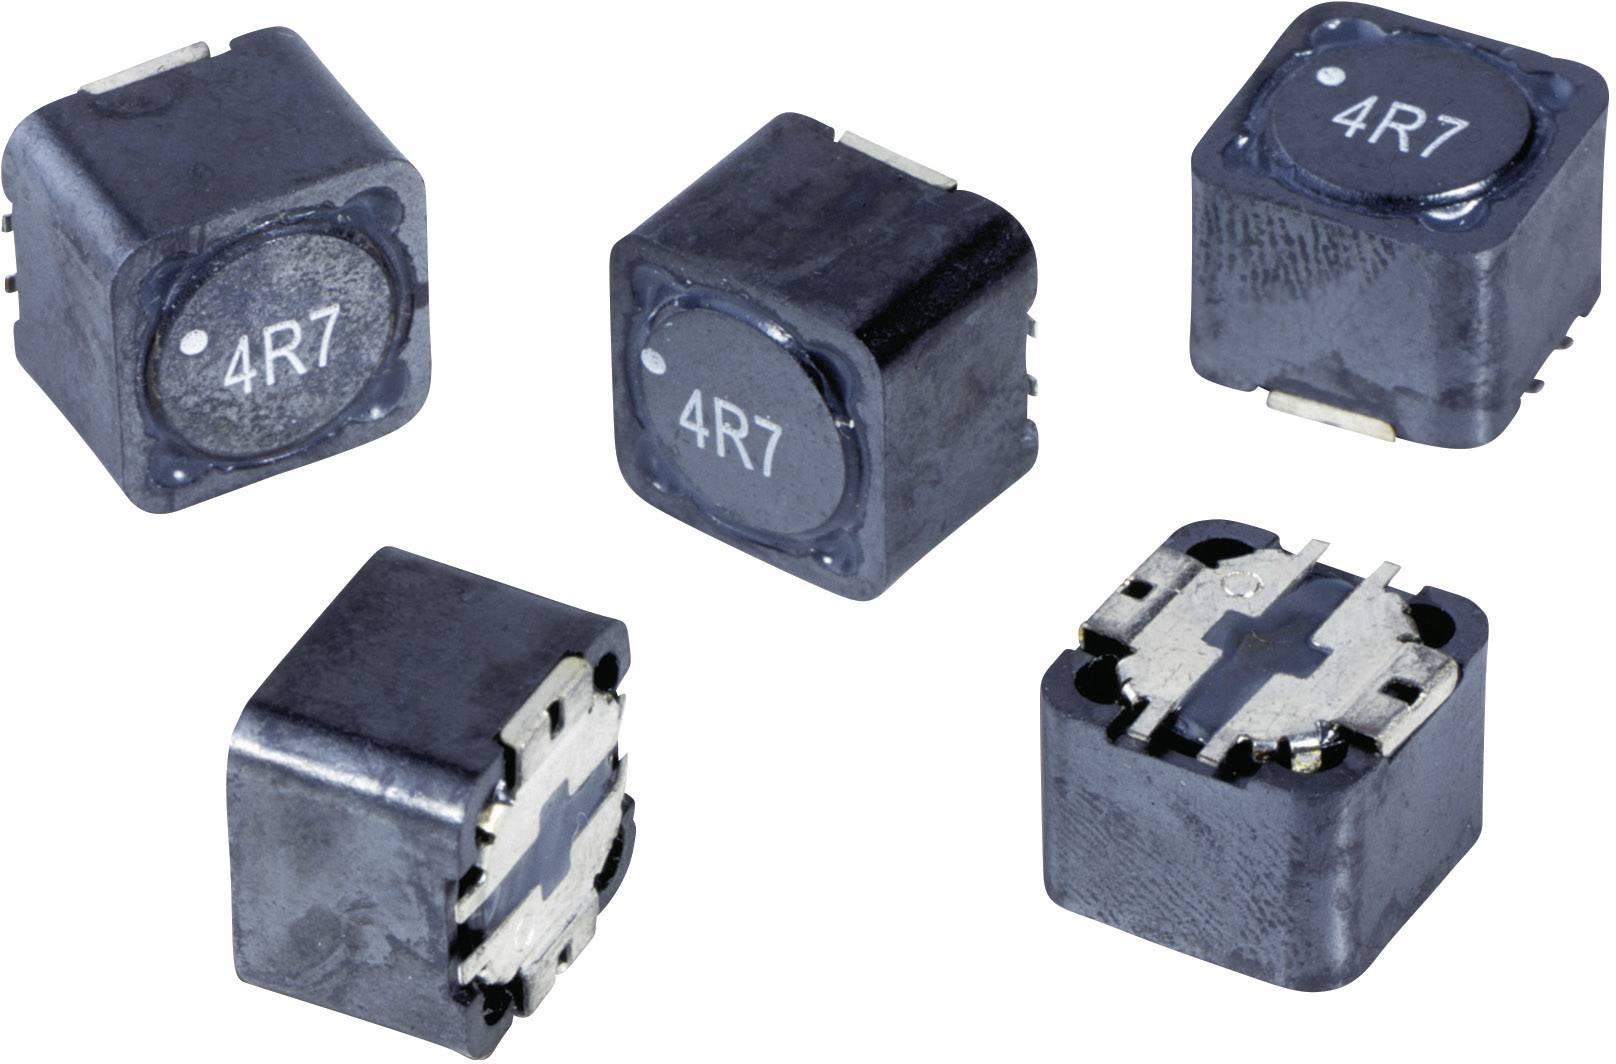 Akumulačná tlmivka SMD Würth Elektronik WE-PD 74477124, 470 µH, 0.64 A, 1260, 1 ks